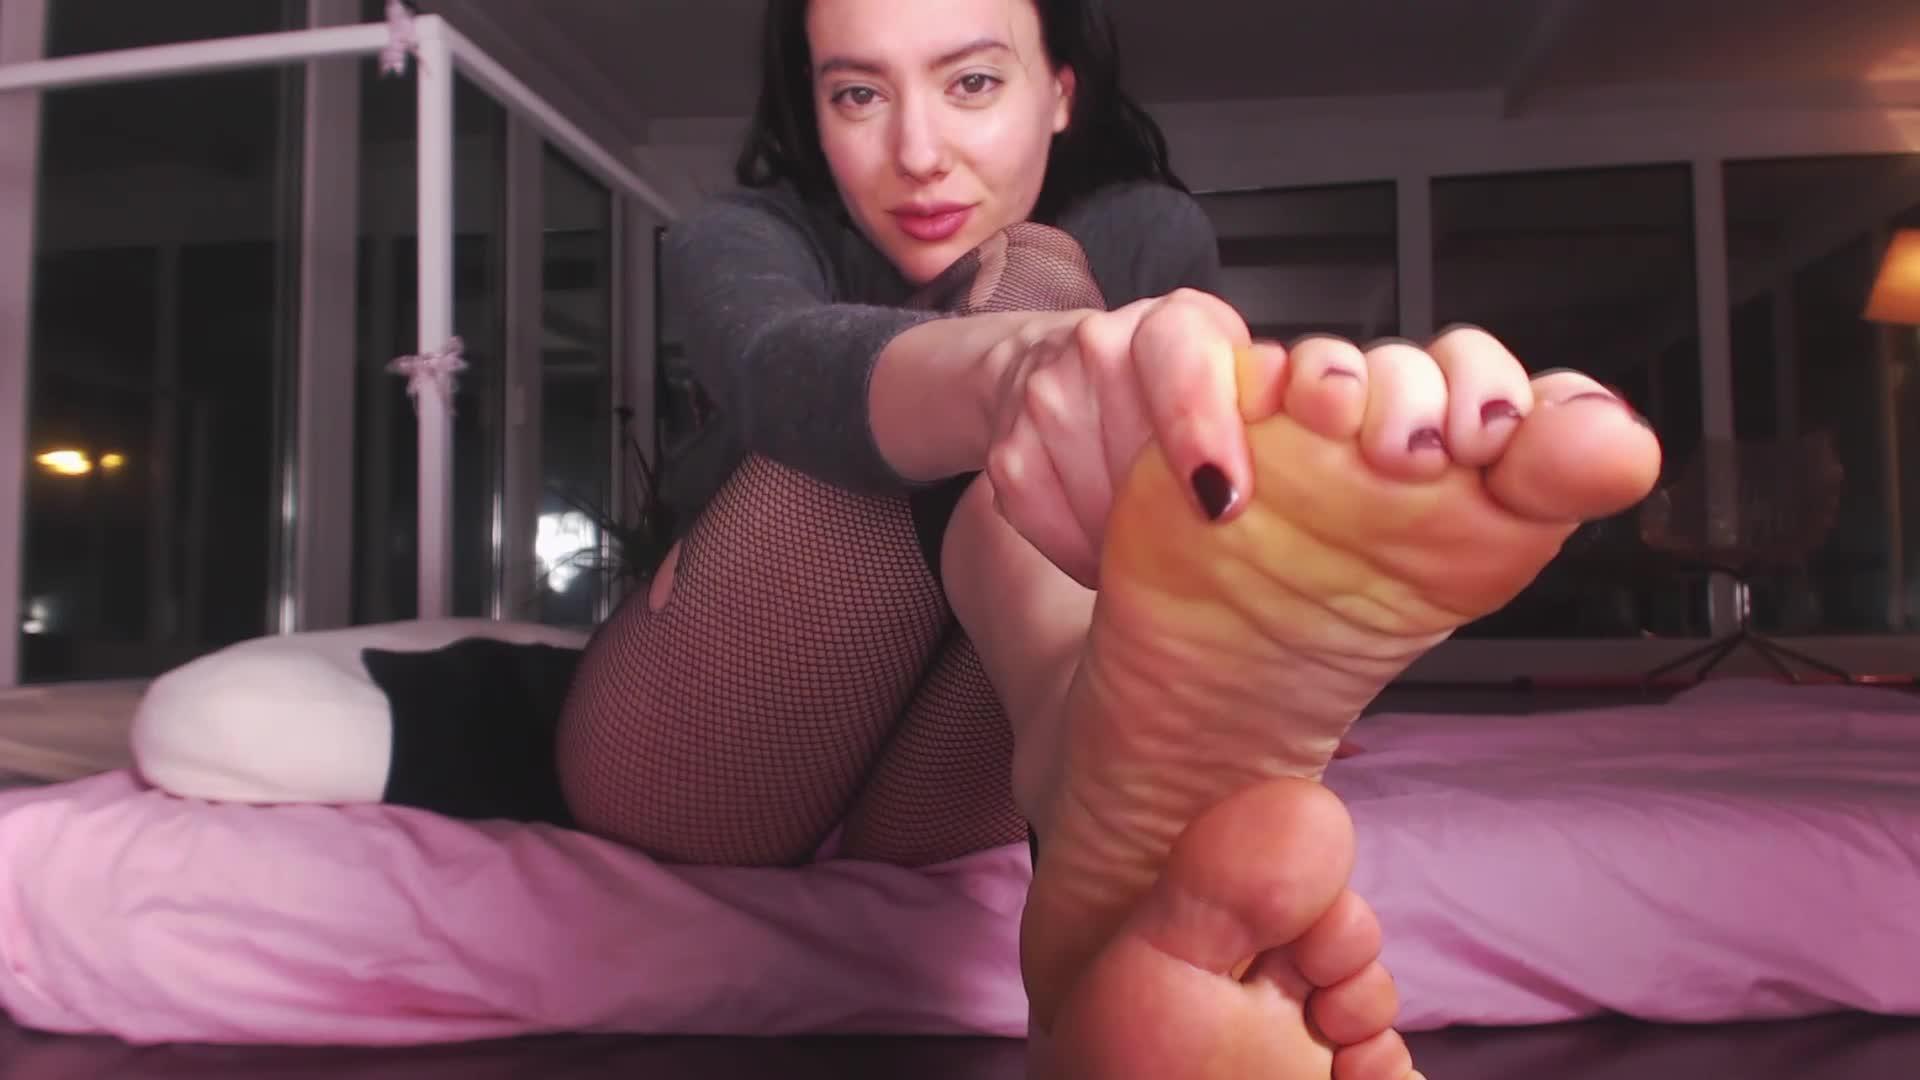 Male Slave Serving Mistress